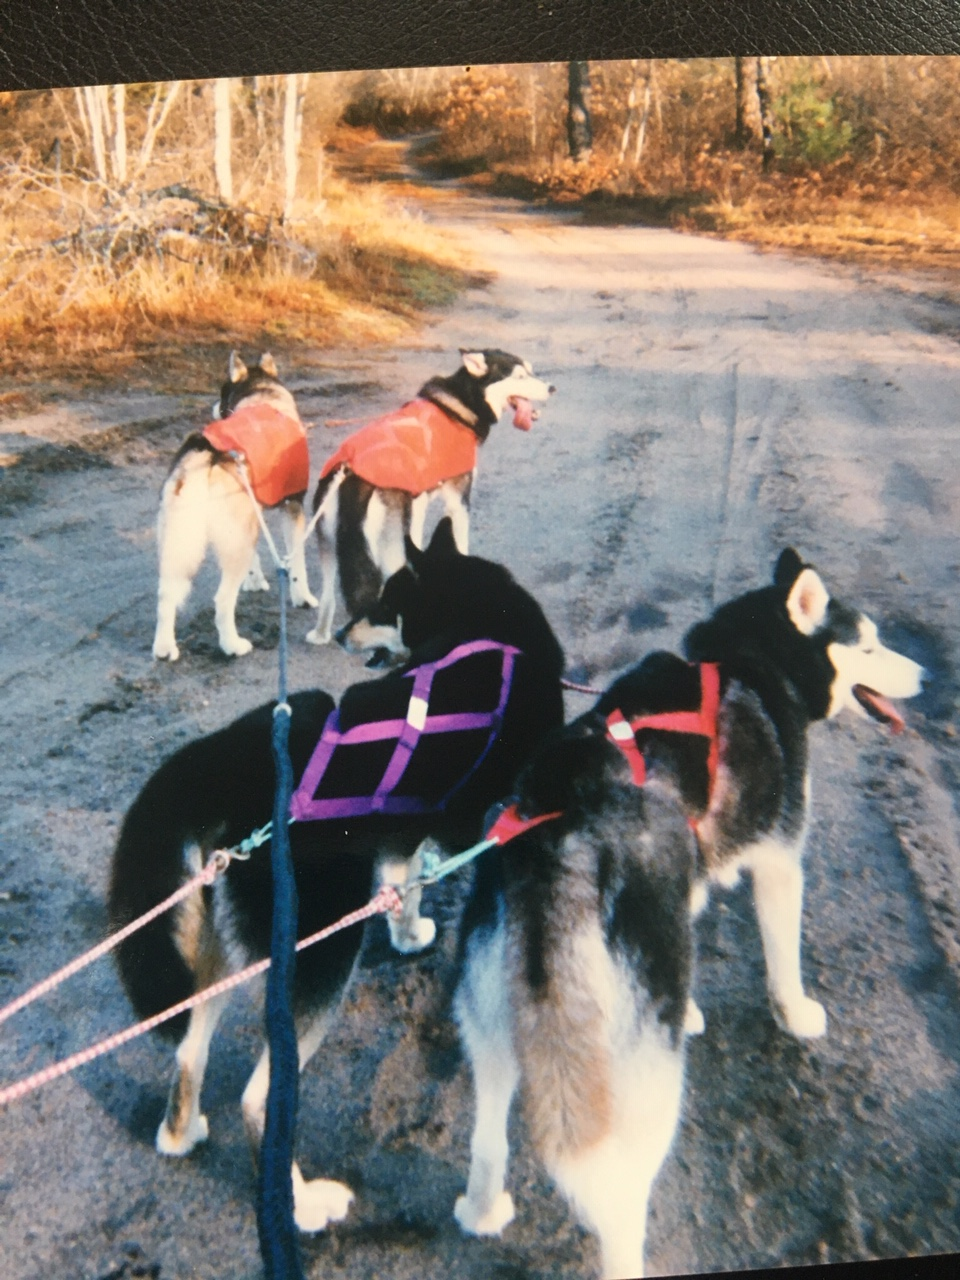 Tua & Alta, preparing for a run with Tobin & Leika in Maine